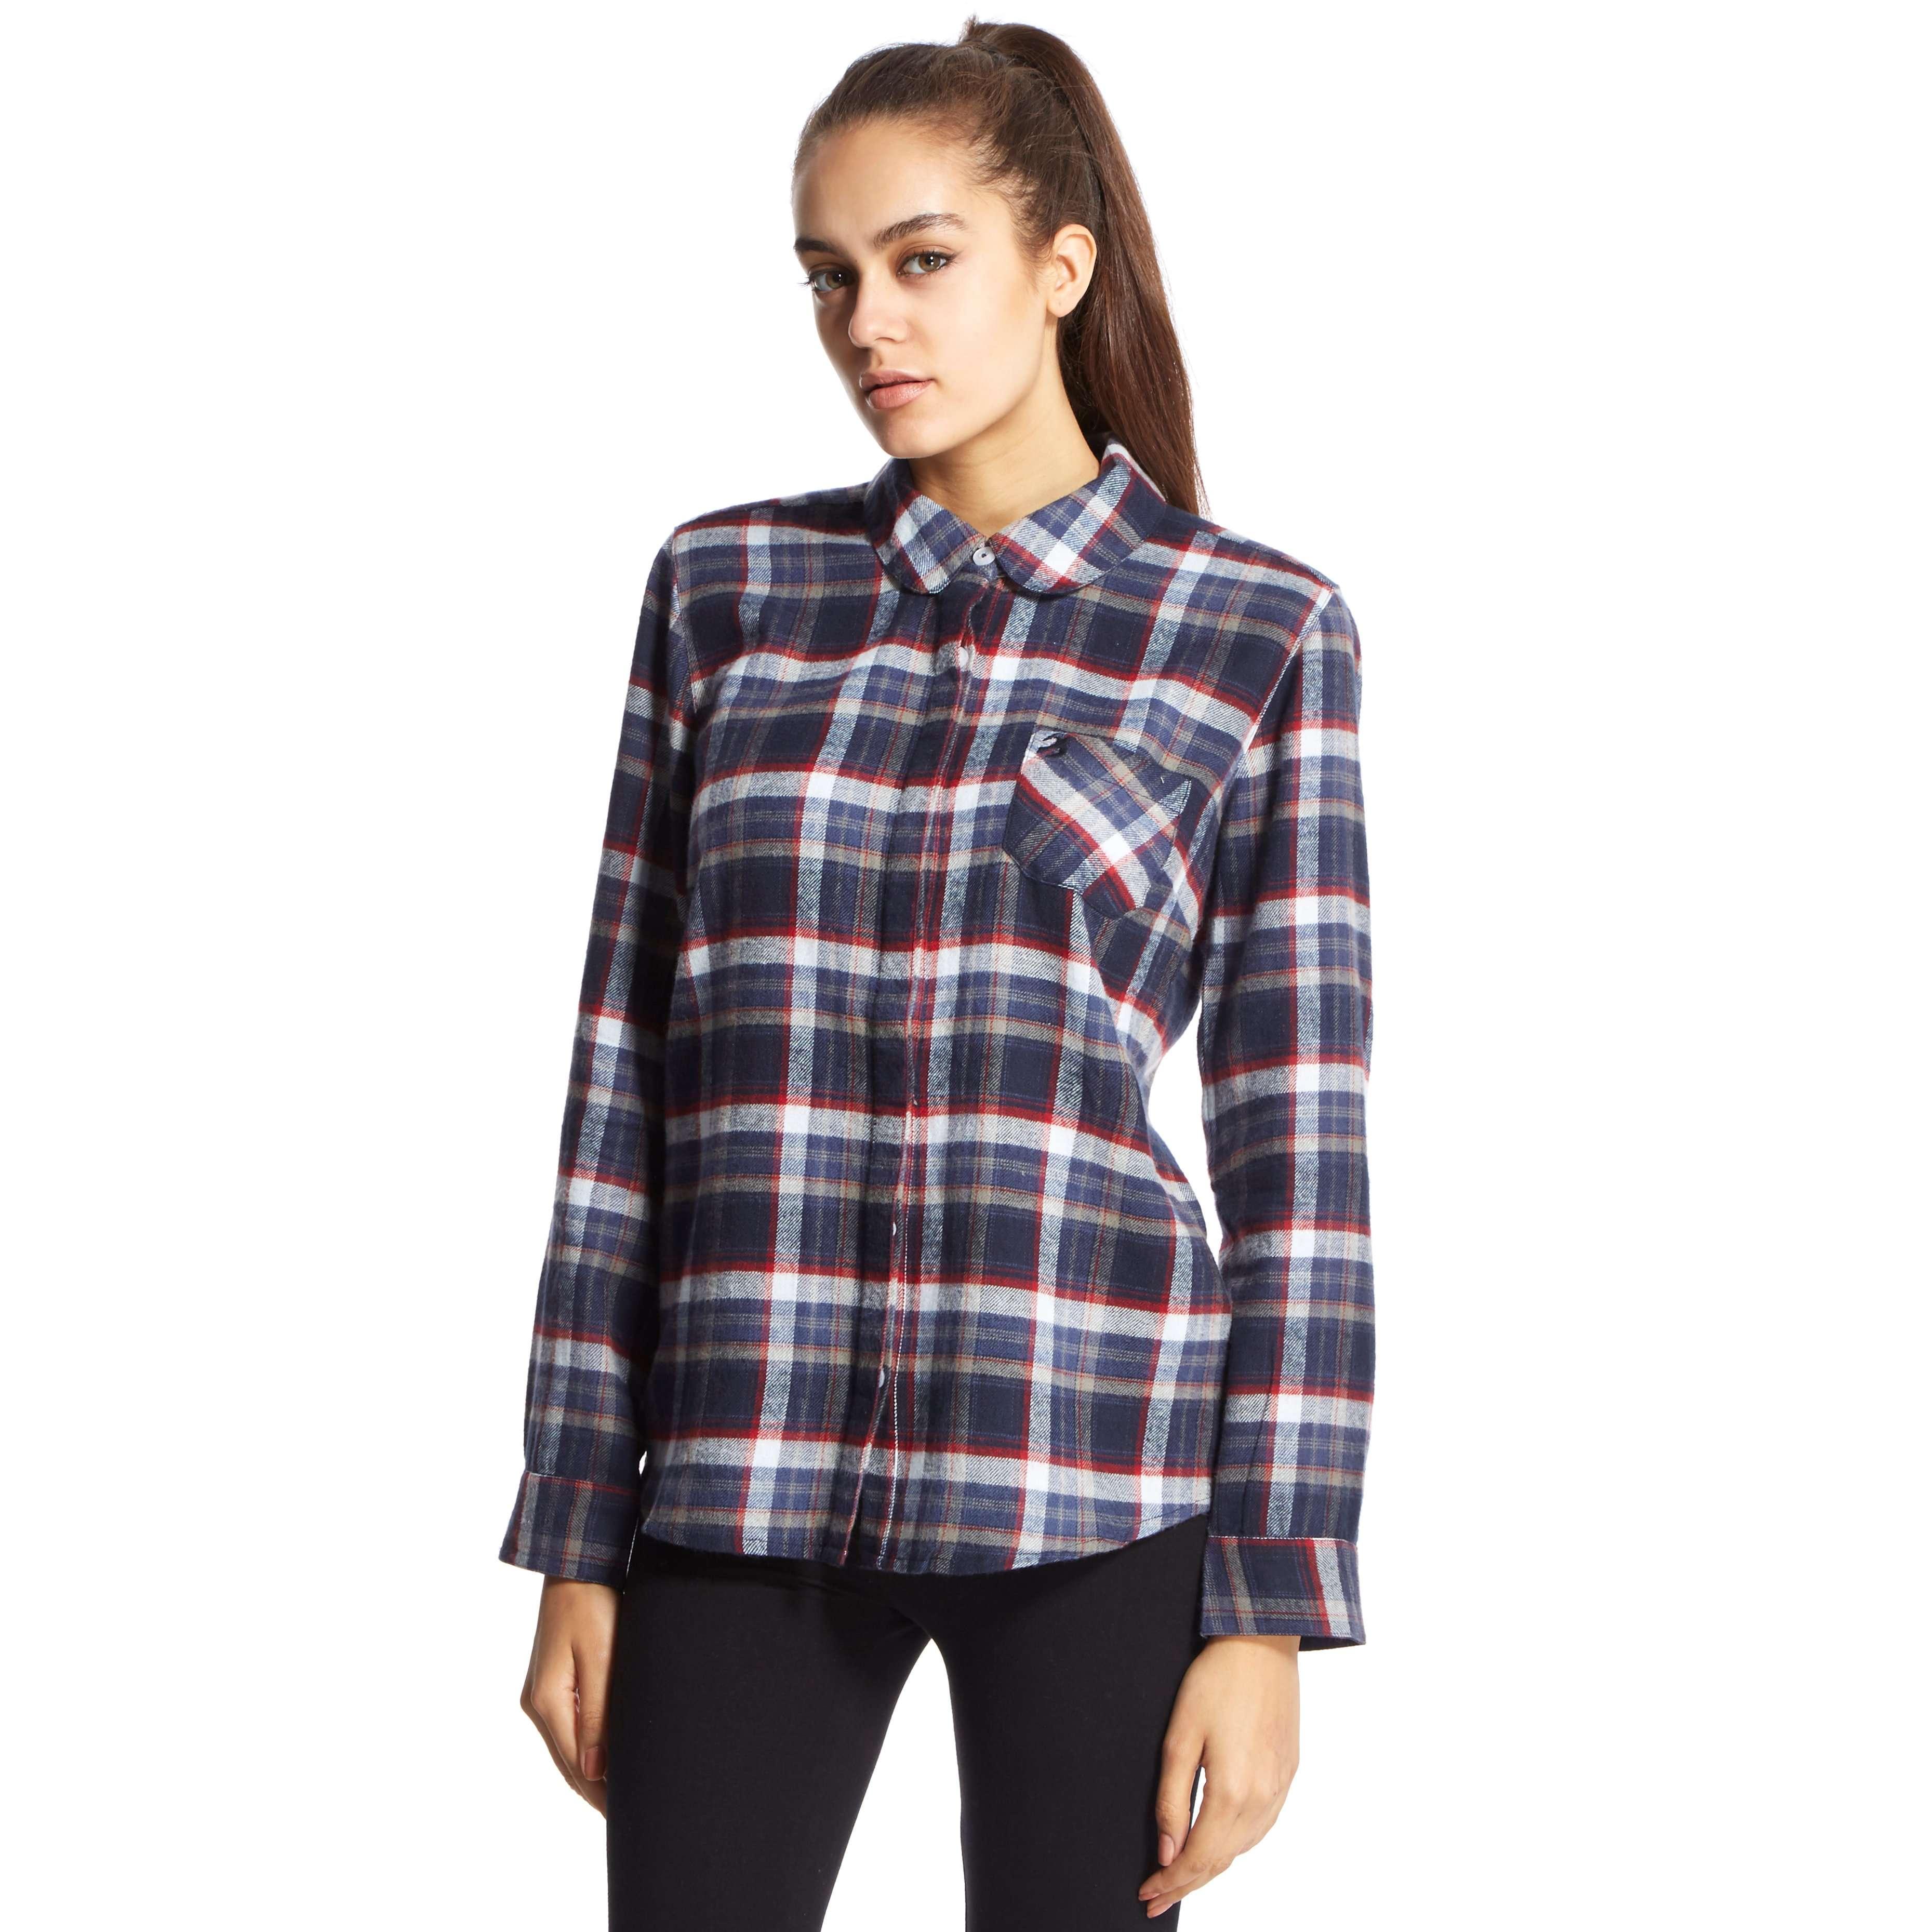 BRAKEBURN Women's Check Shirt